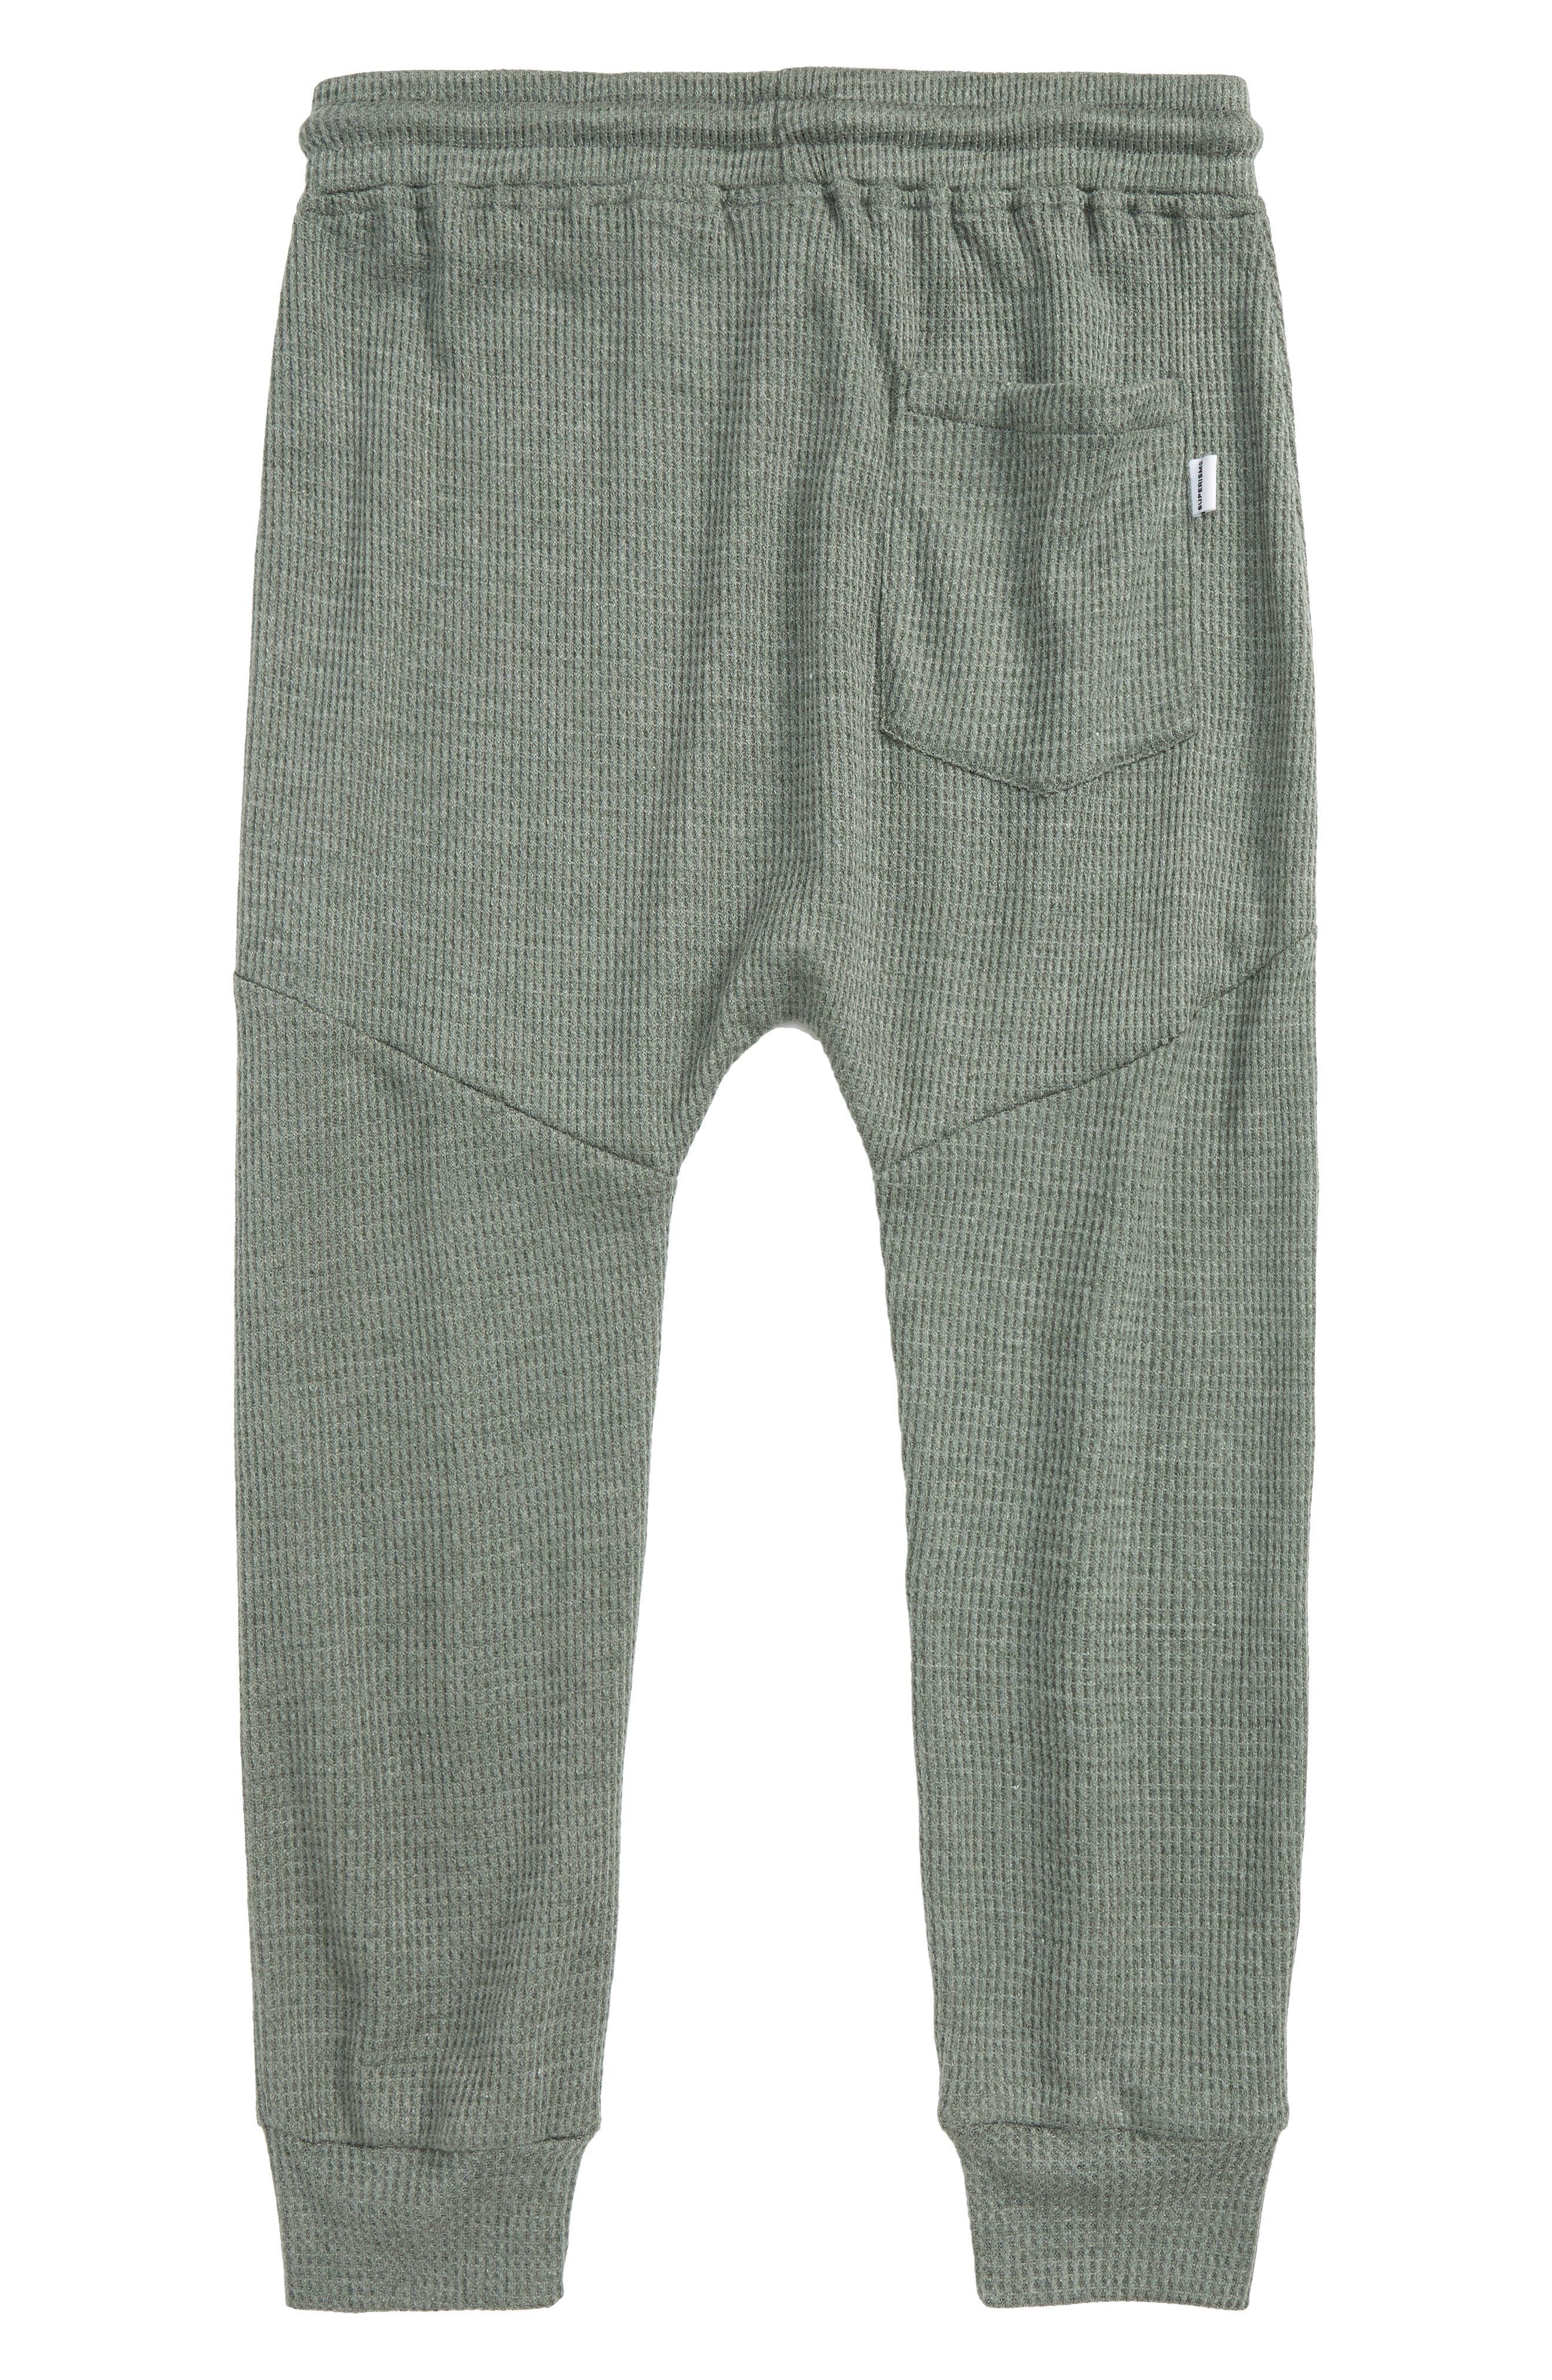 Alternate Image 2  - Superism Jude Thermal Knit Jogger Pants (Big Boys)